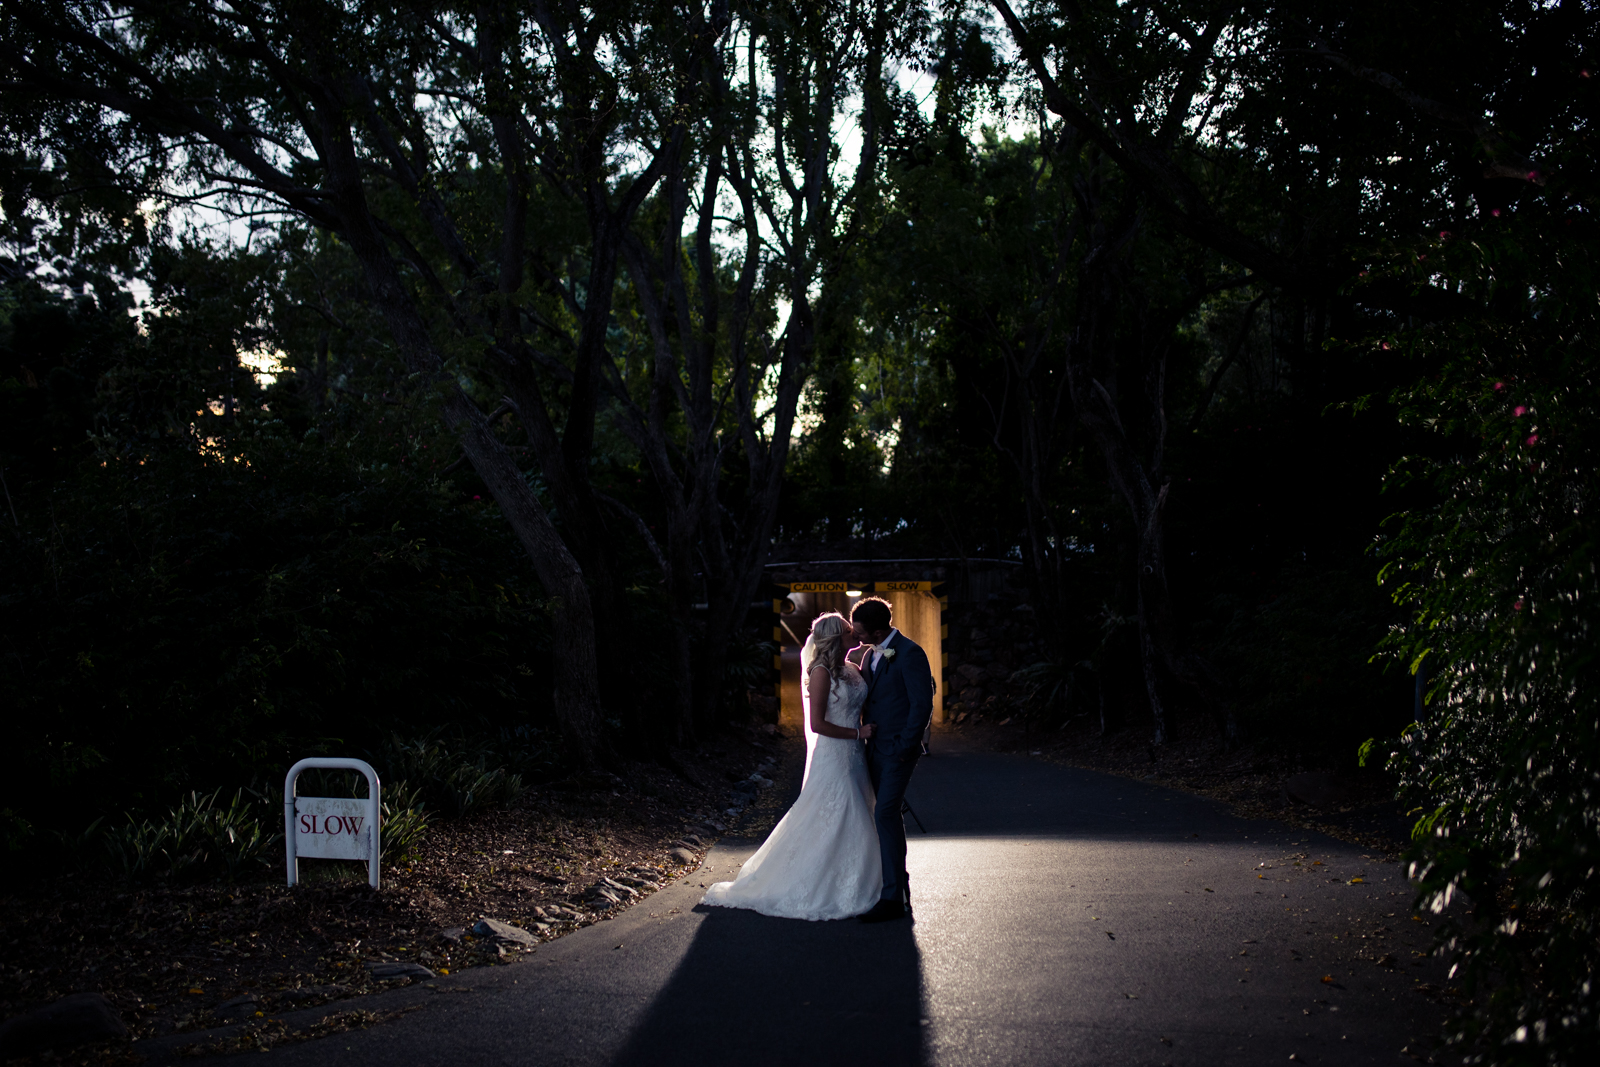 A silhouette image taken by J'adore weddings